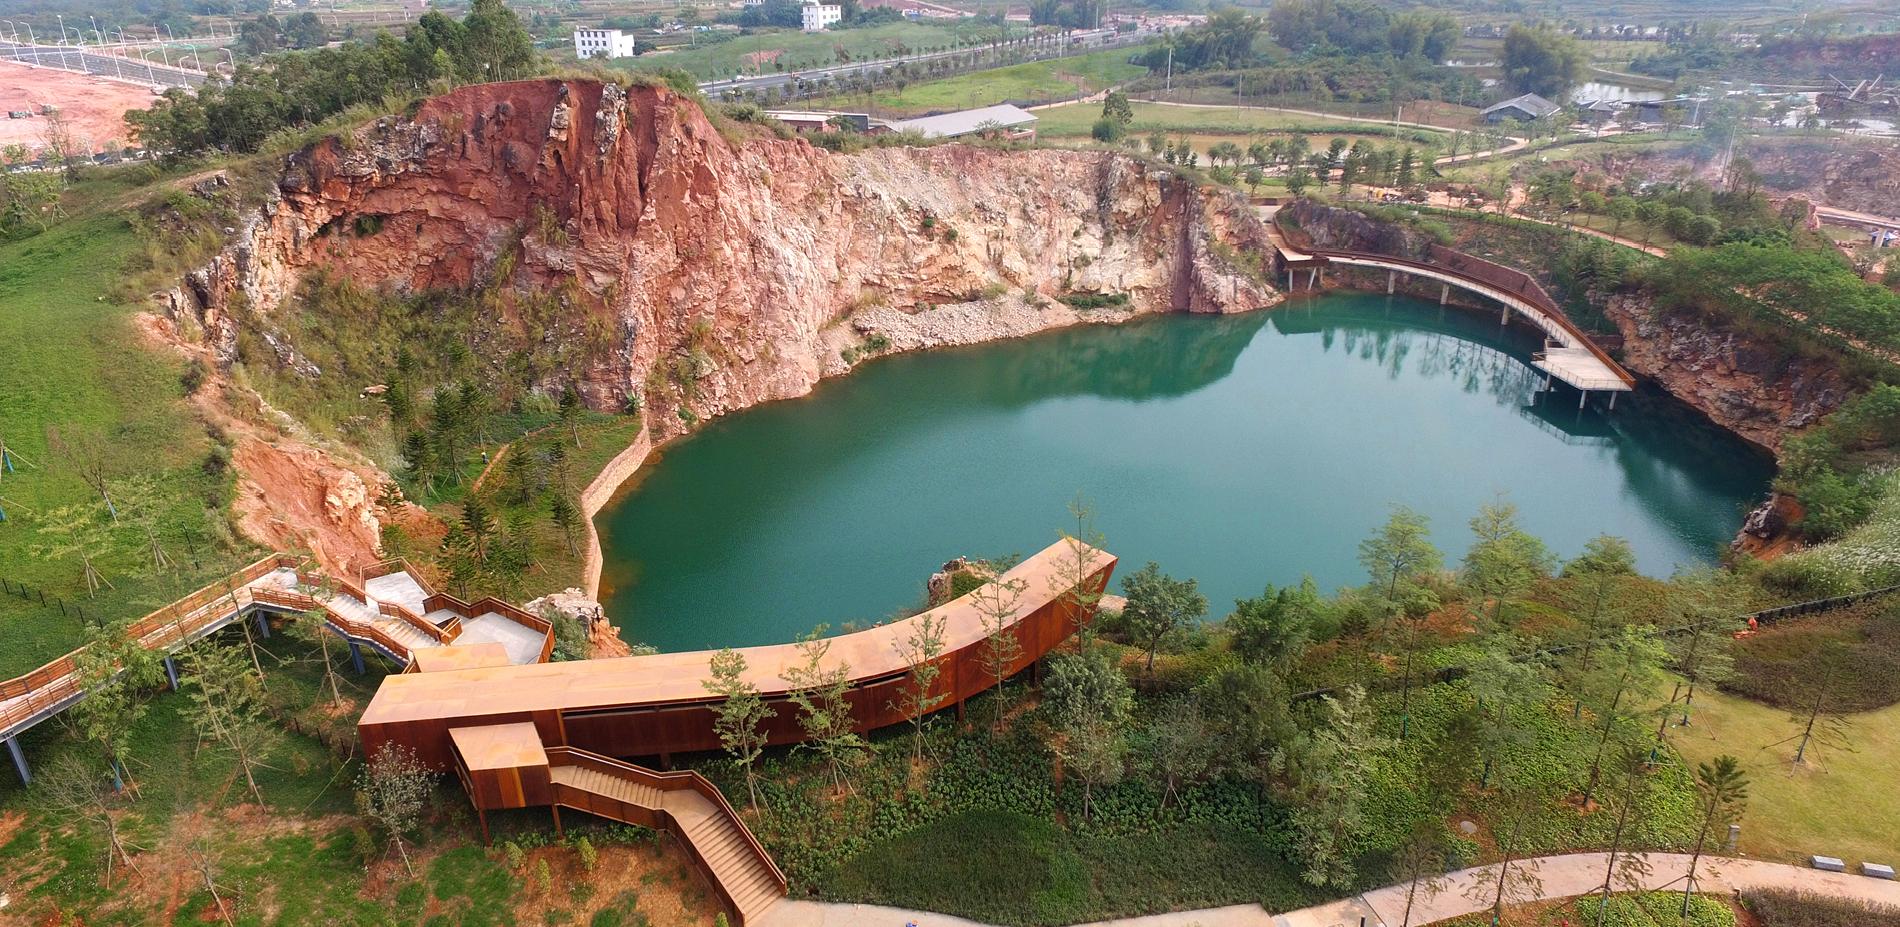 Enjoying Landscape of Jade Pond and Steep Cliff (Quarry No. 4)